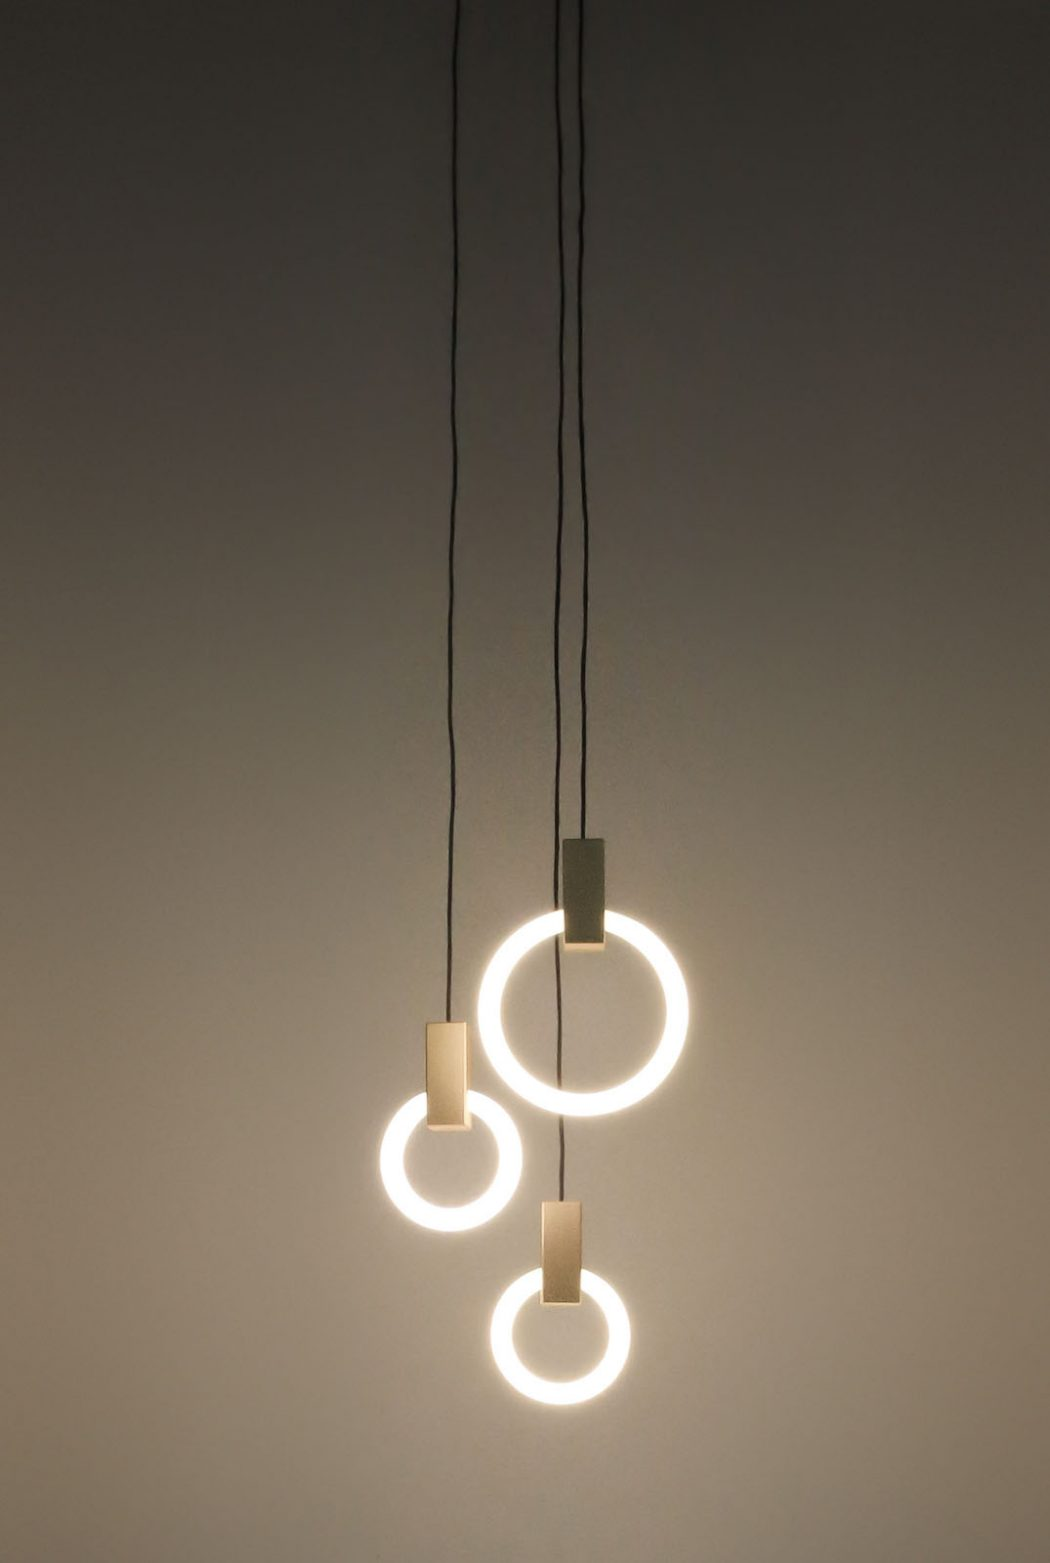 Halo-Lamp-1.jpeg